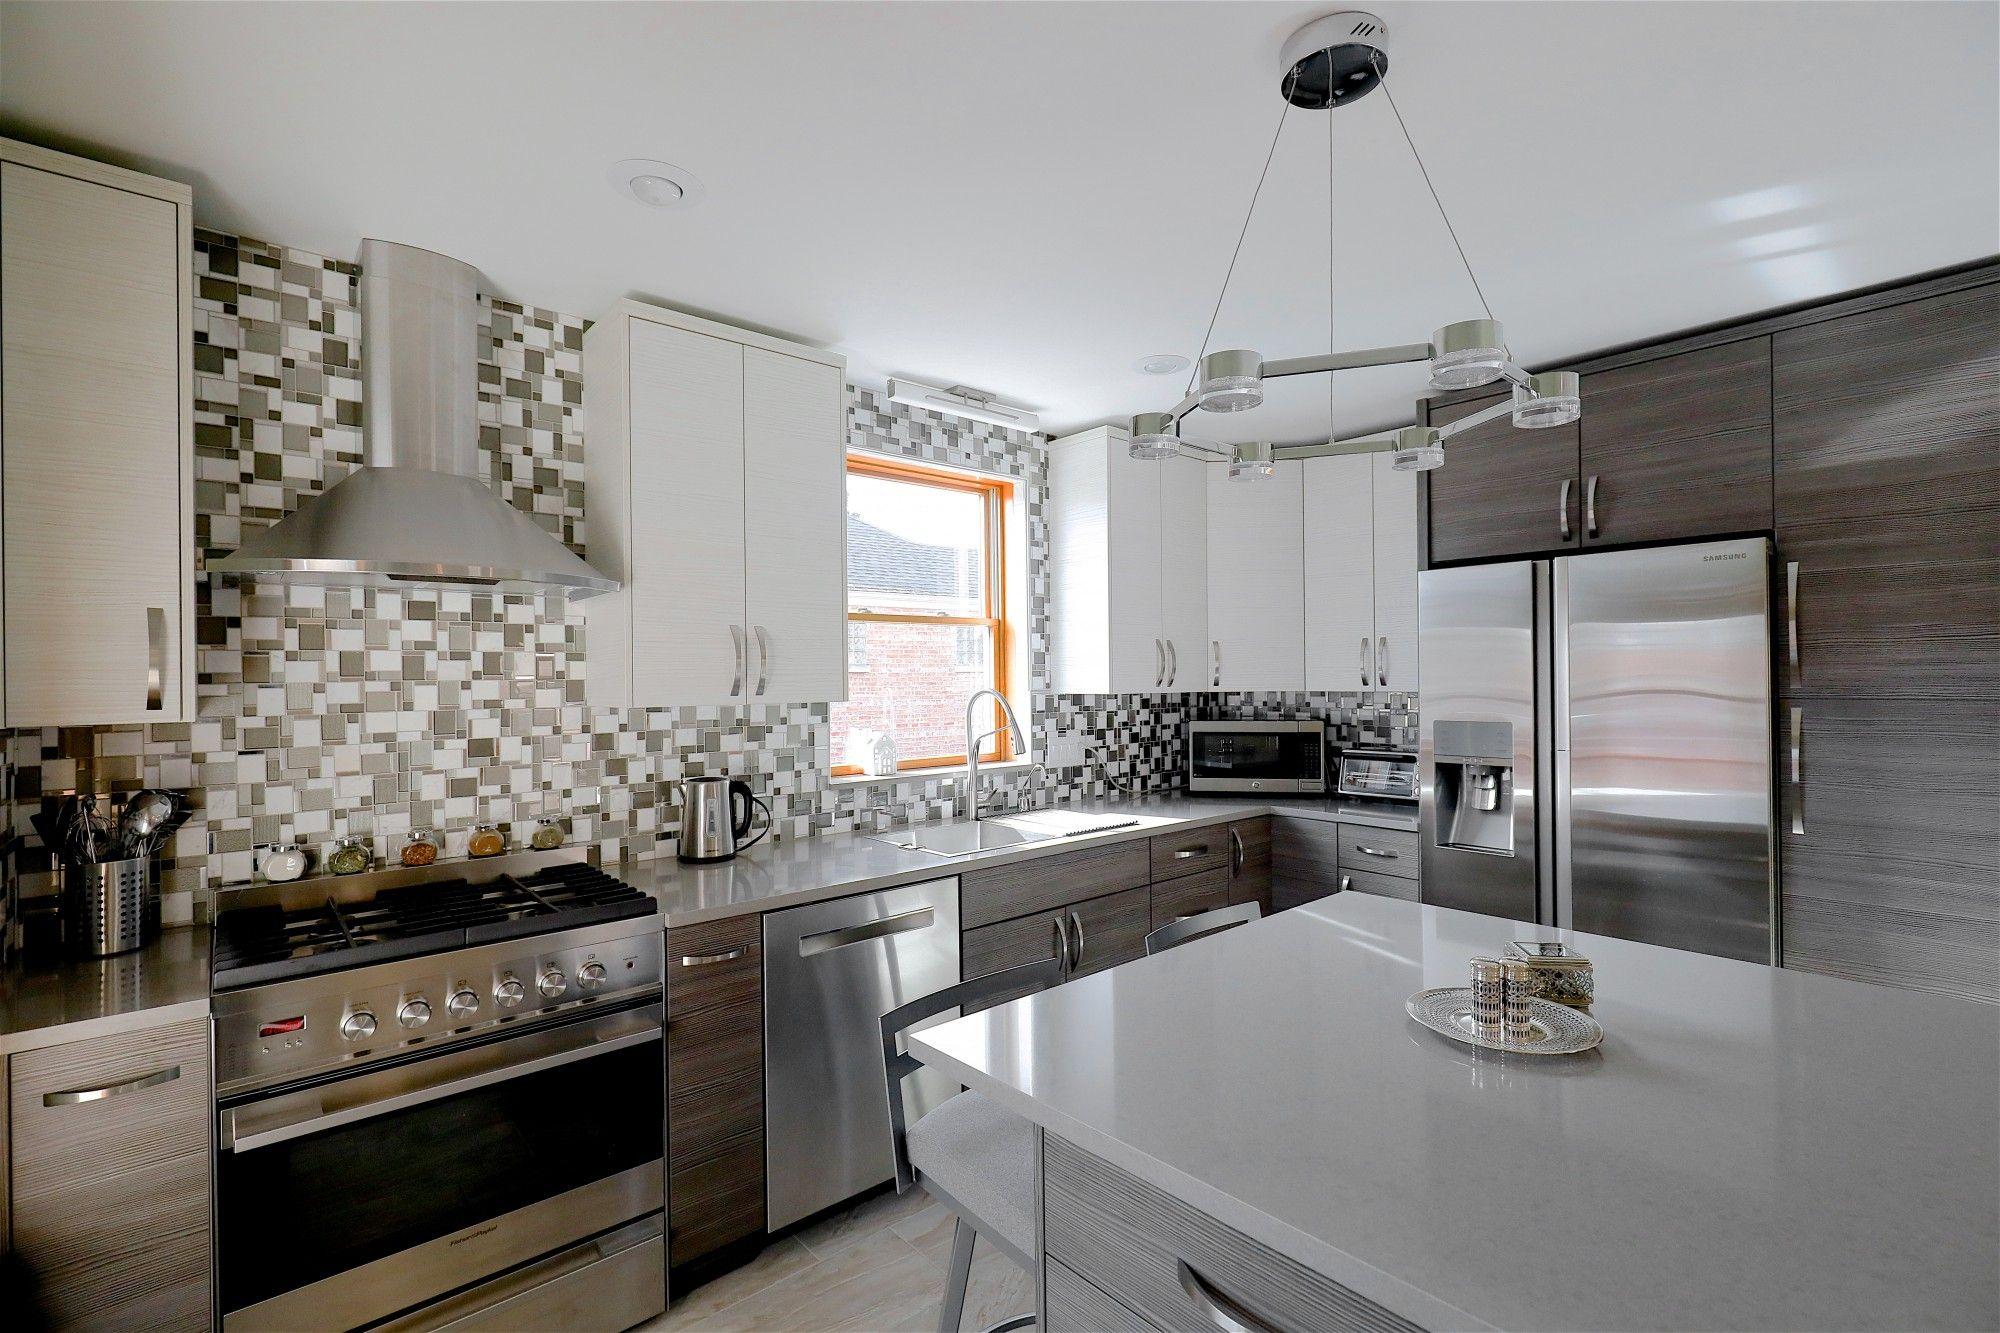 Lava Nessa Stock Cabinets Melamine Kitchen Design Decor Orange Kitchen Decor Kitchen Decor Themes